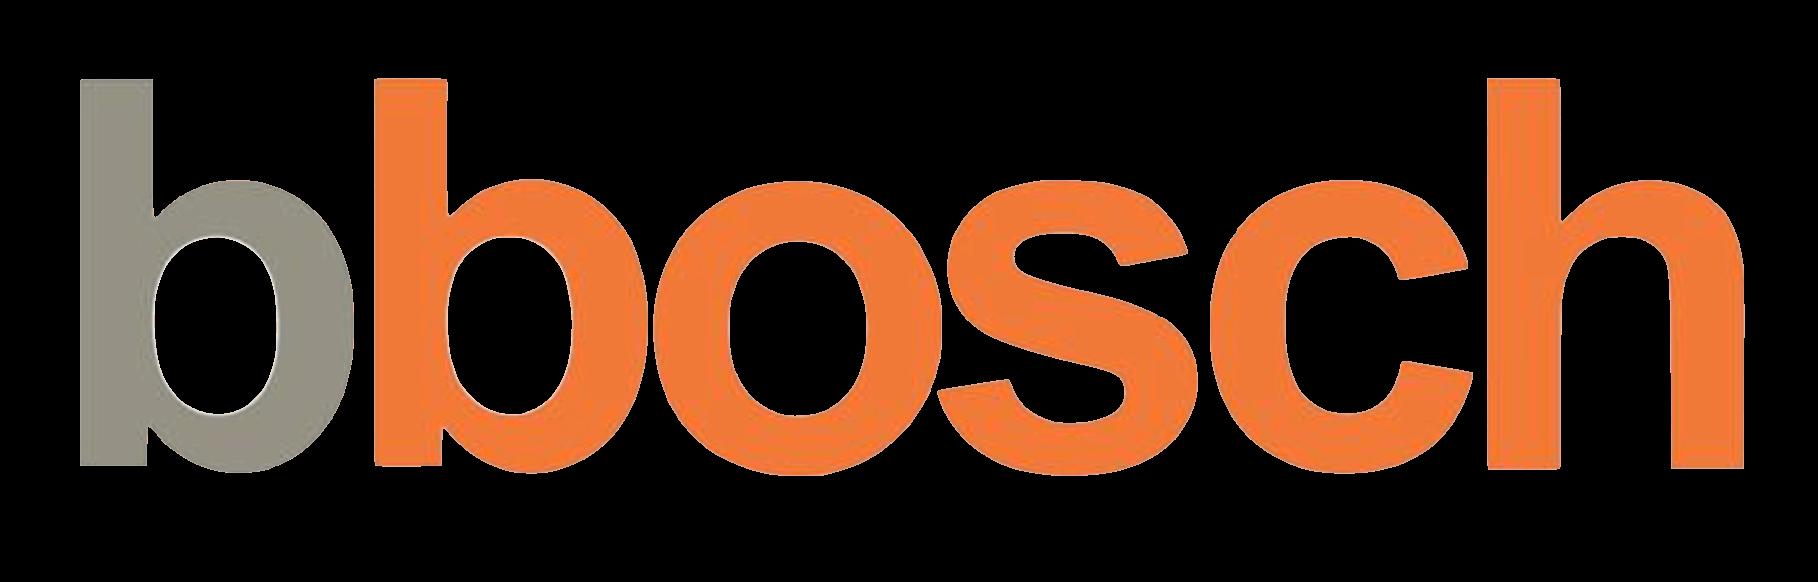 https://gzero.cl/wp-content/uploads/2021/07/004_bbosch.png